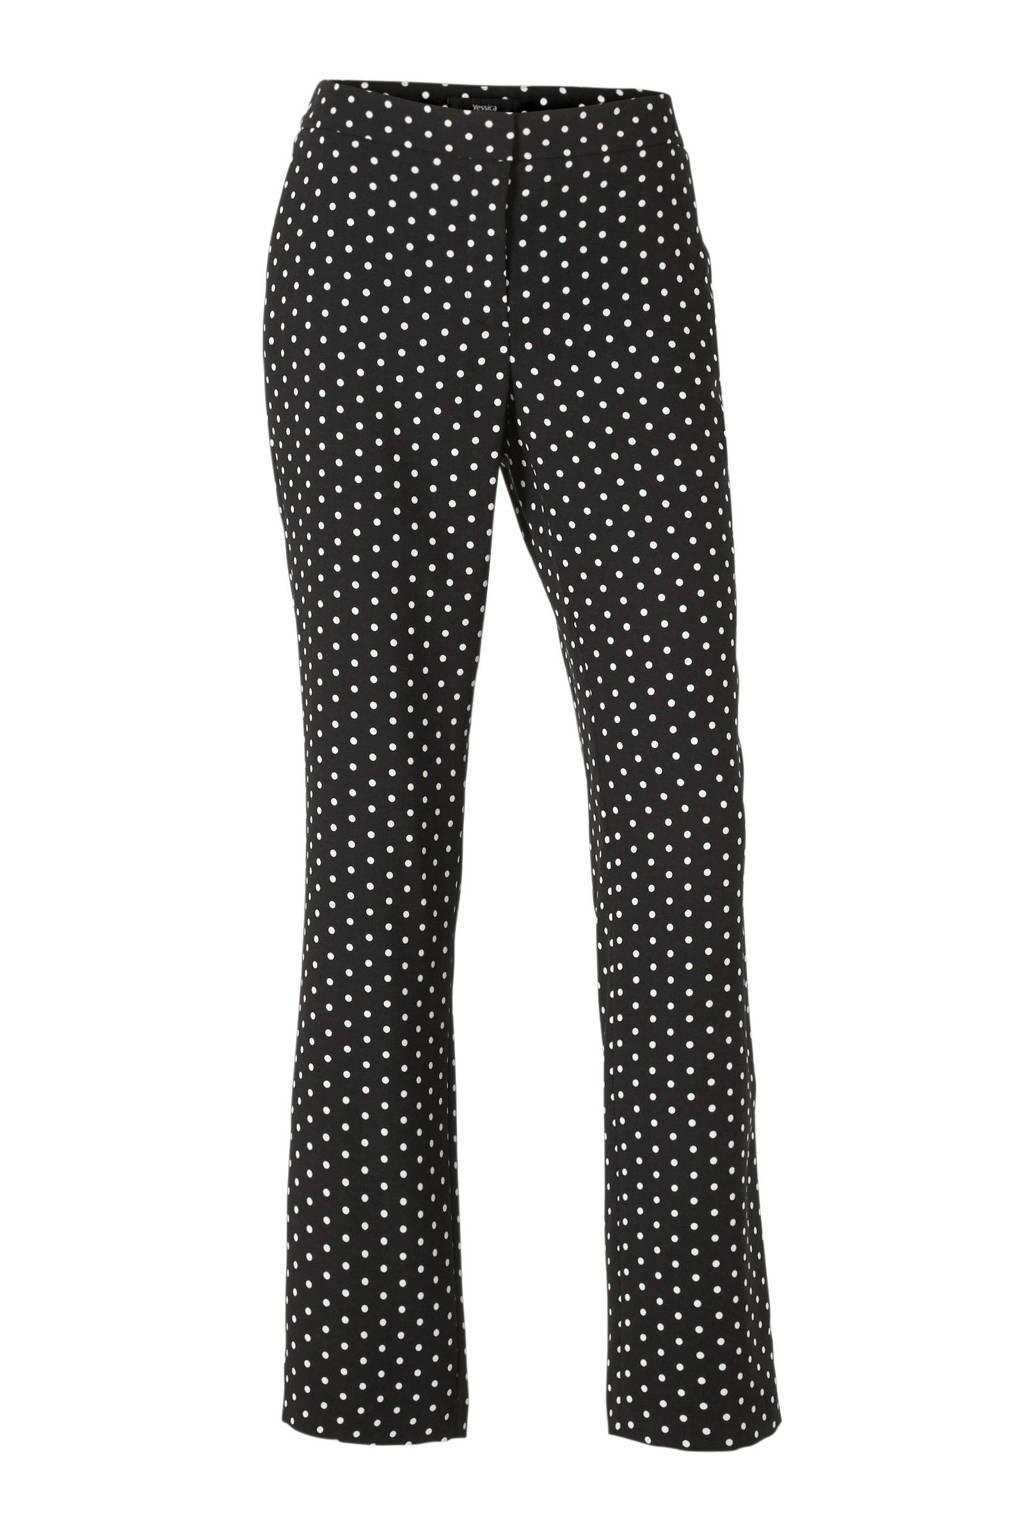 C&A straight fit pantalon met stippen zwart/wit, Zwart/wit